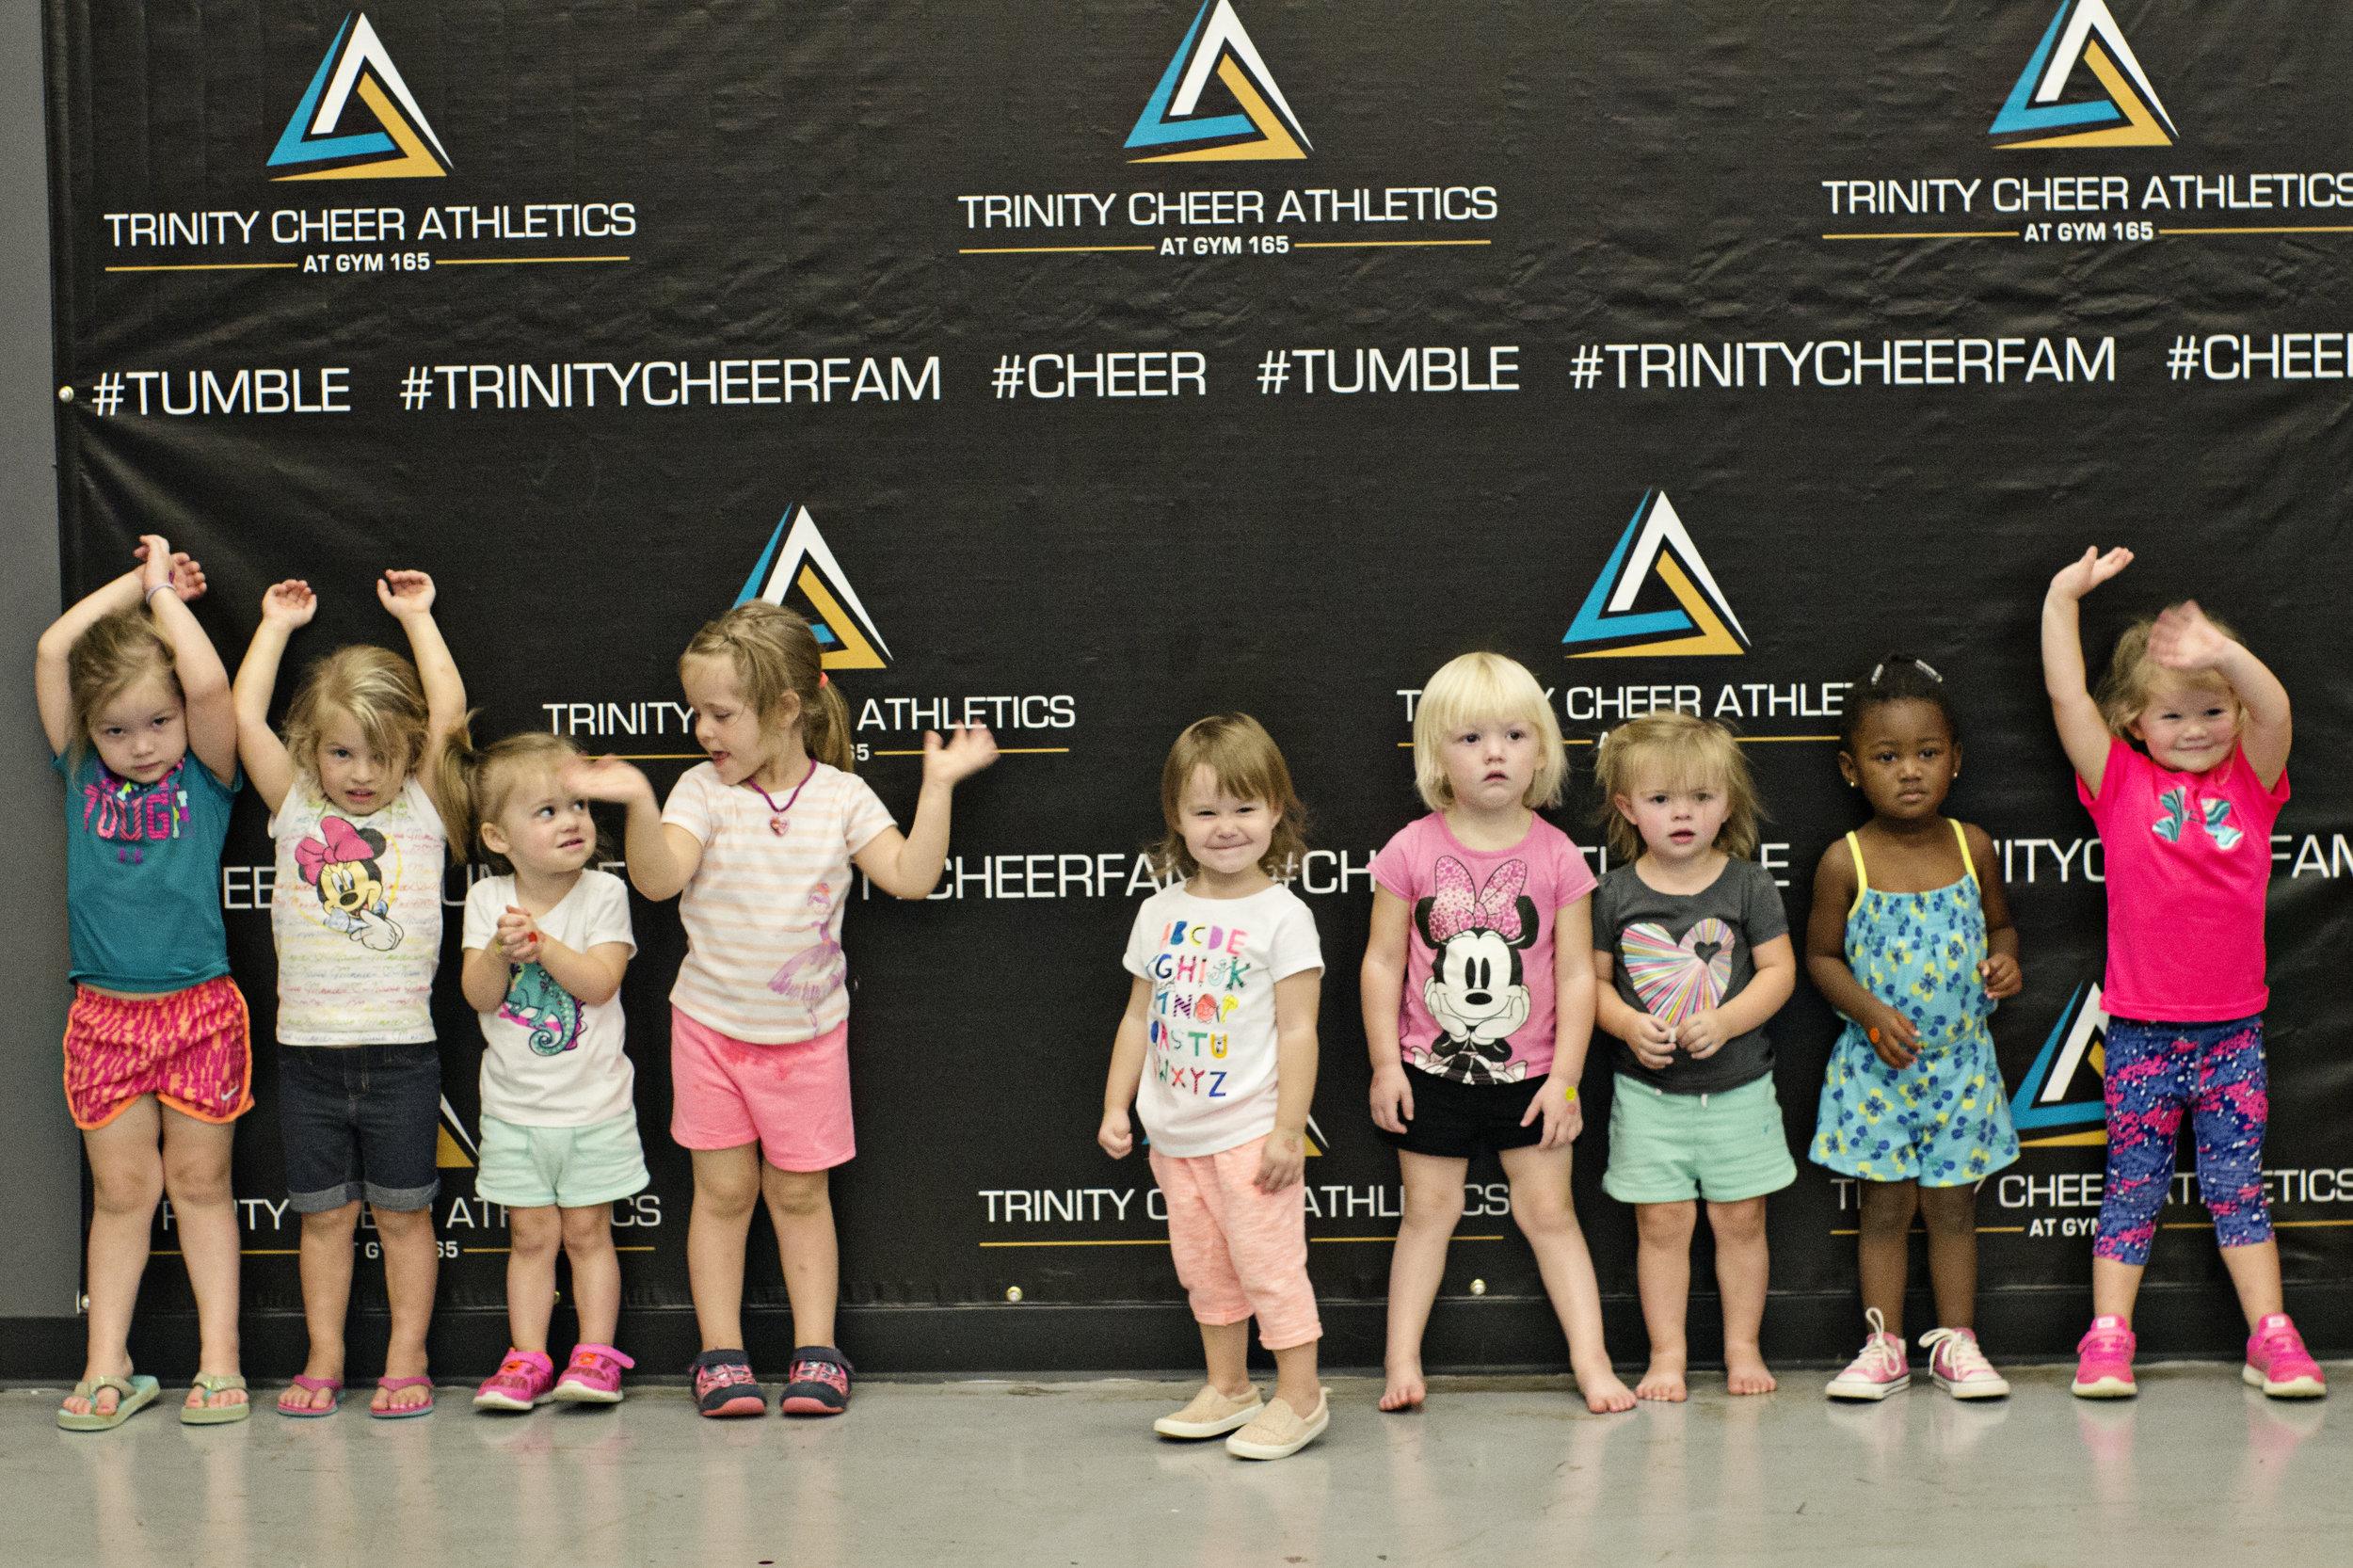 Trinity_Cheer_Athletics_Preschool_047.jpg